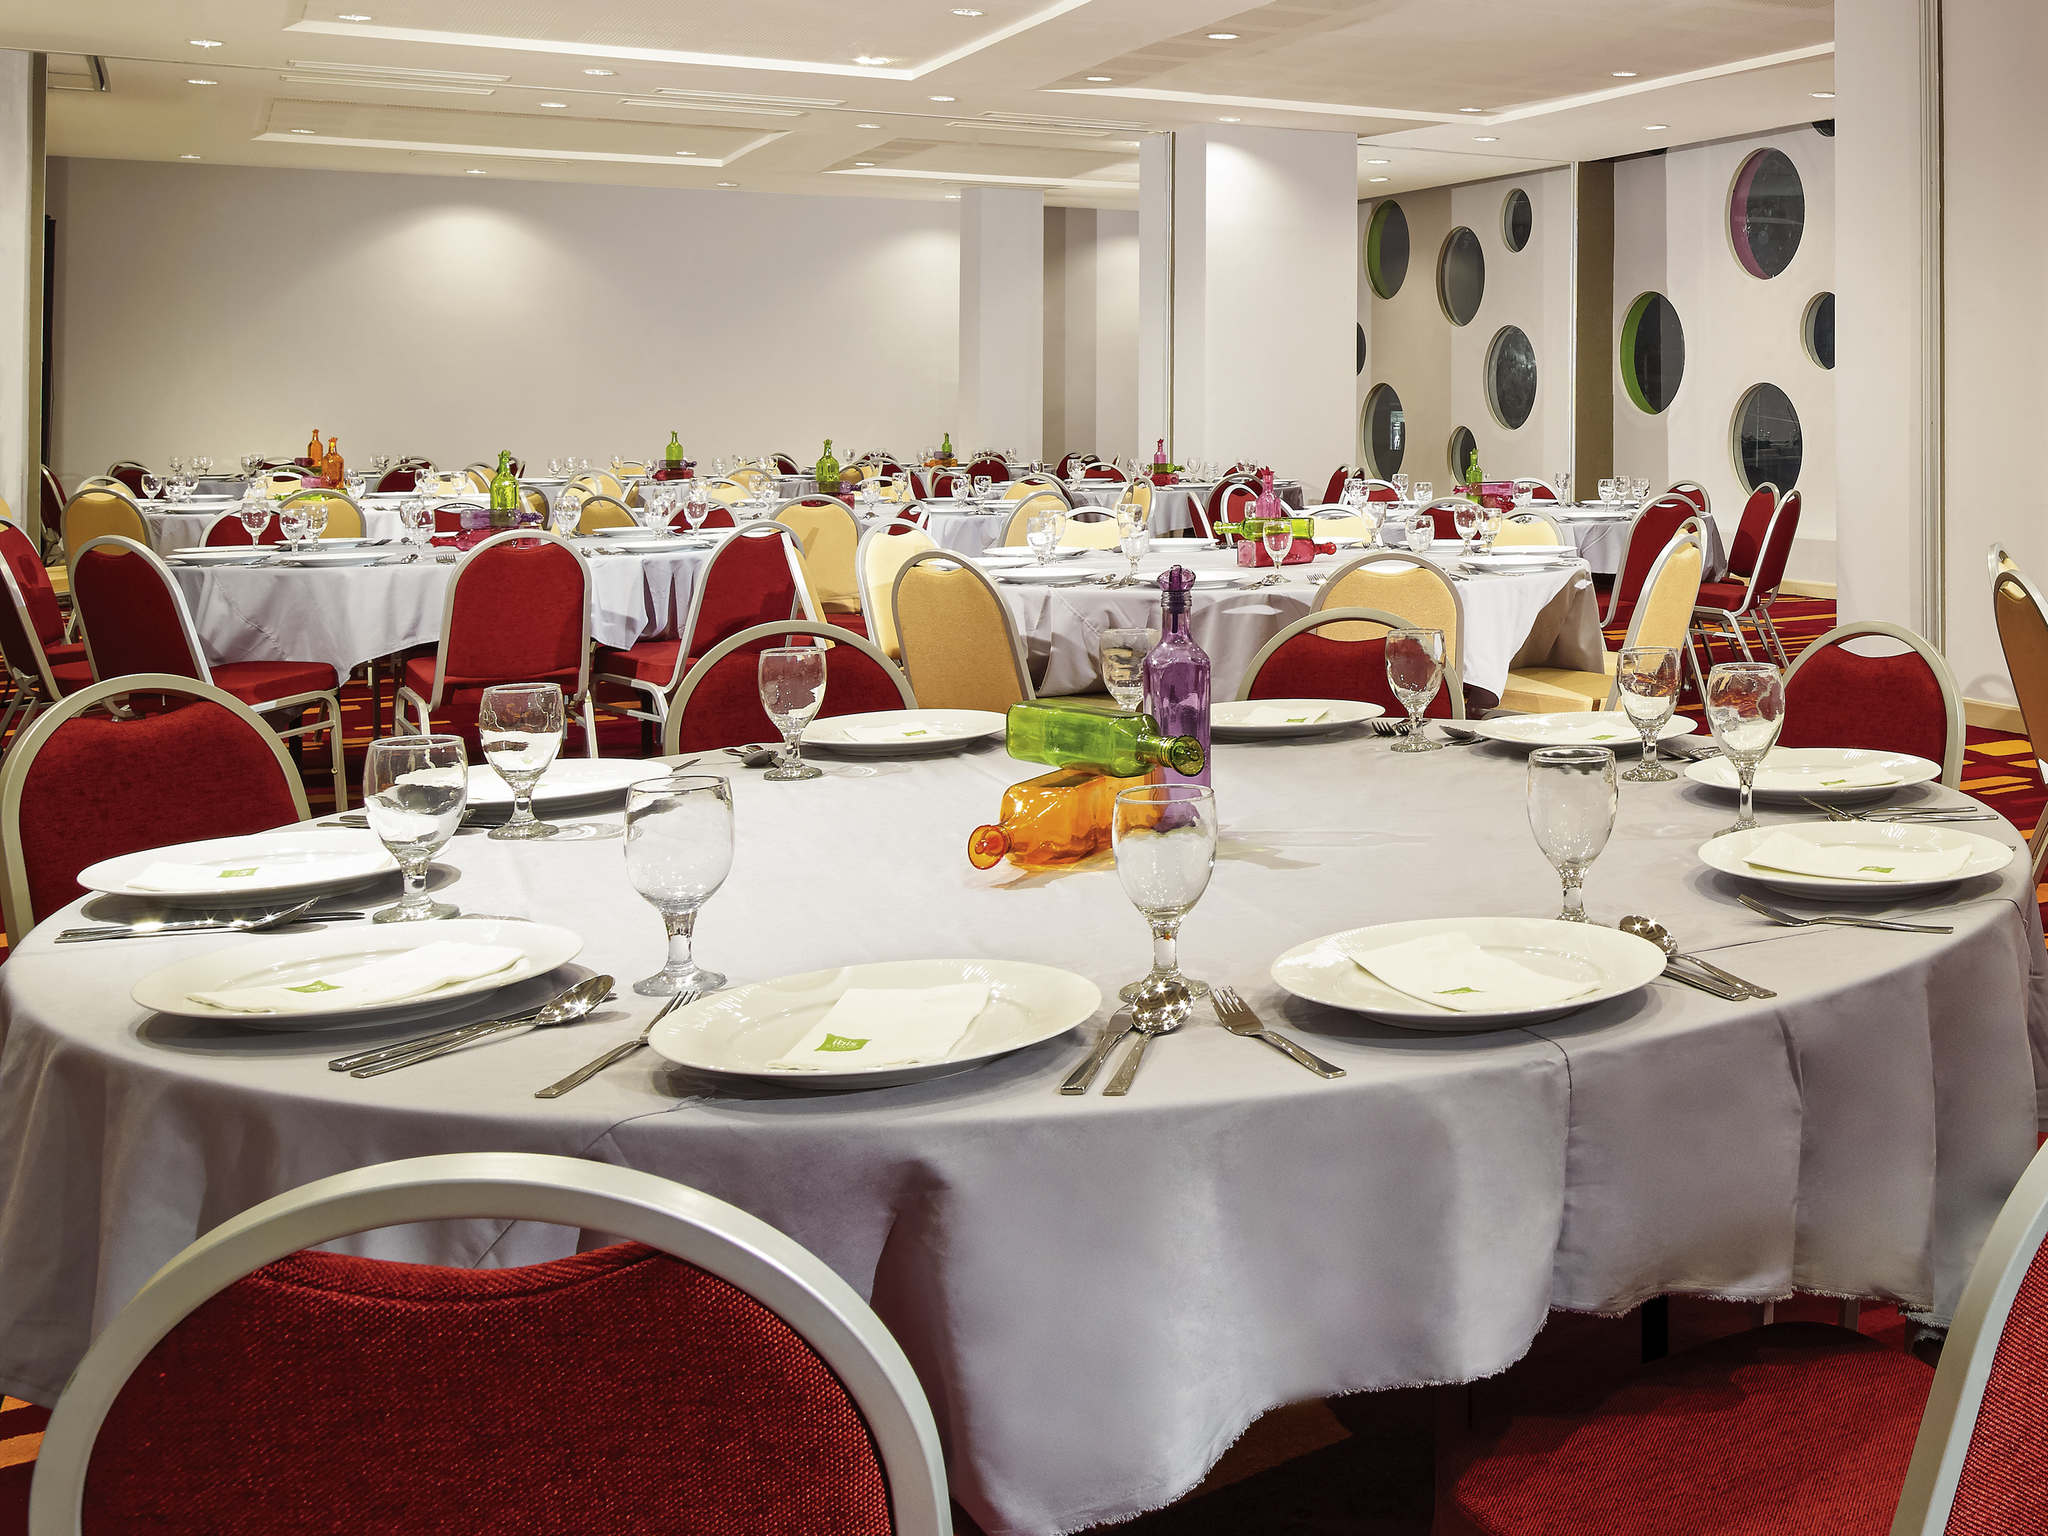 Hotel em malang ibis styles malang reunies e eventos ibis styles malang junglespirit Images